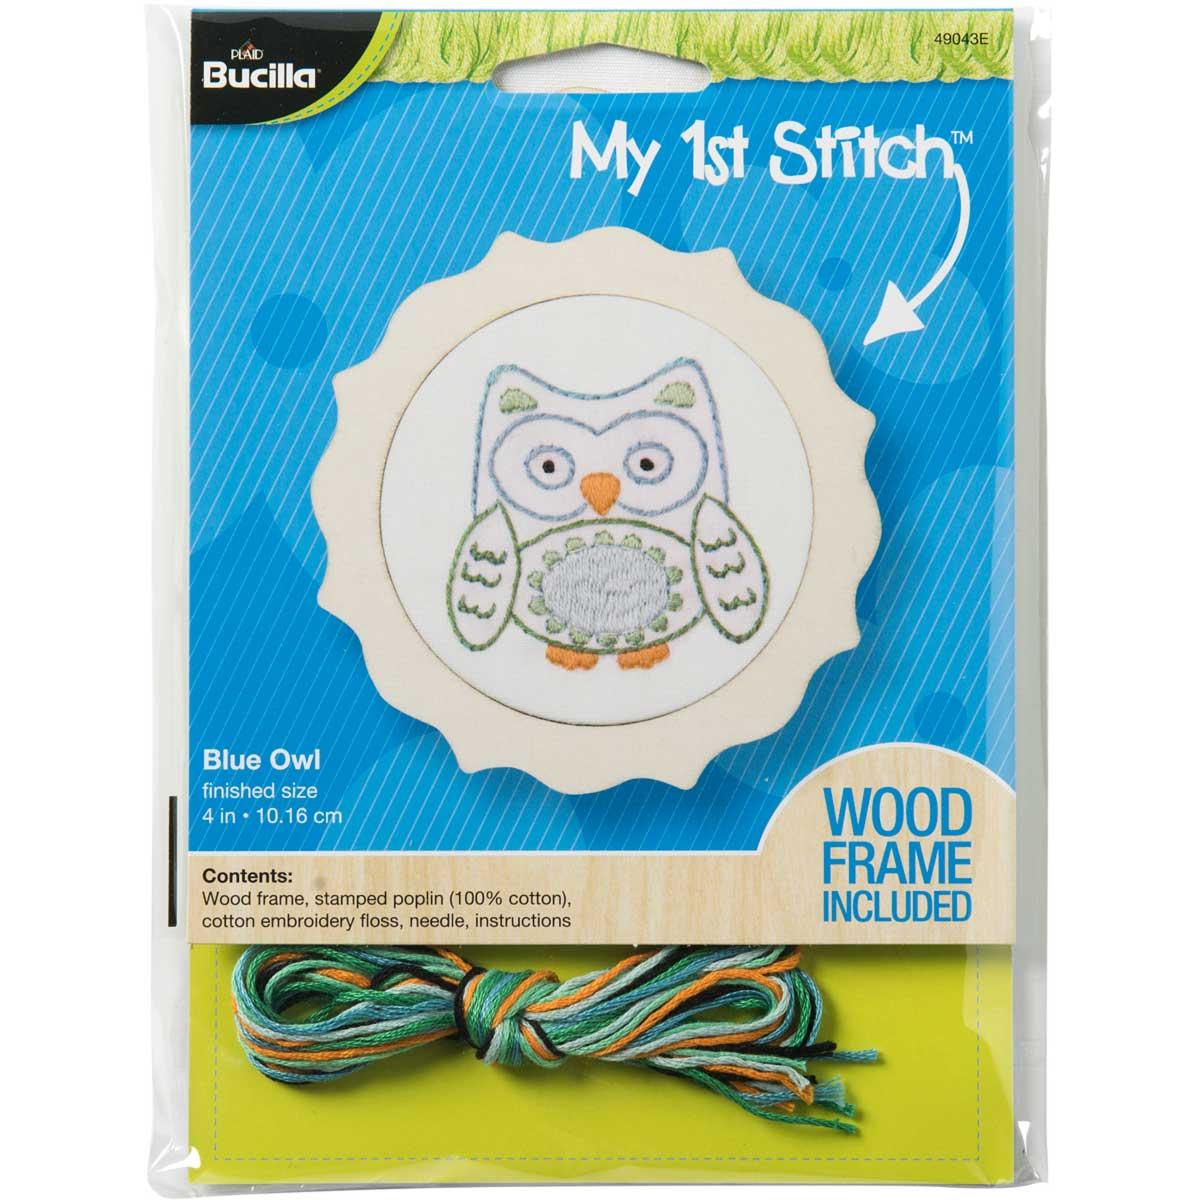 Bucilla ® My 1st Stitch™ - Stamped Embroidery Kits - Blue Owl